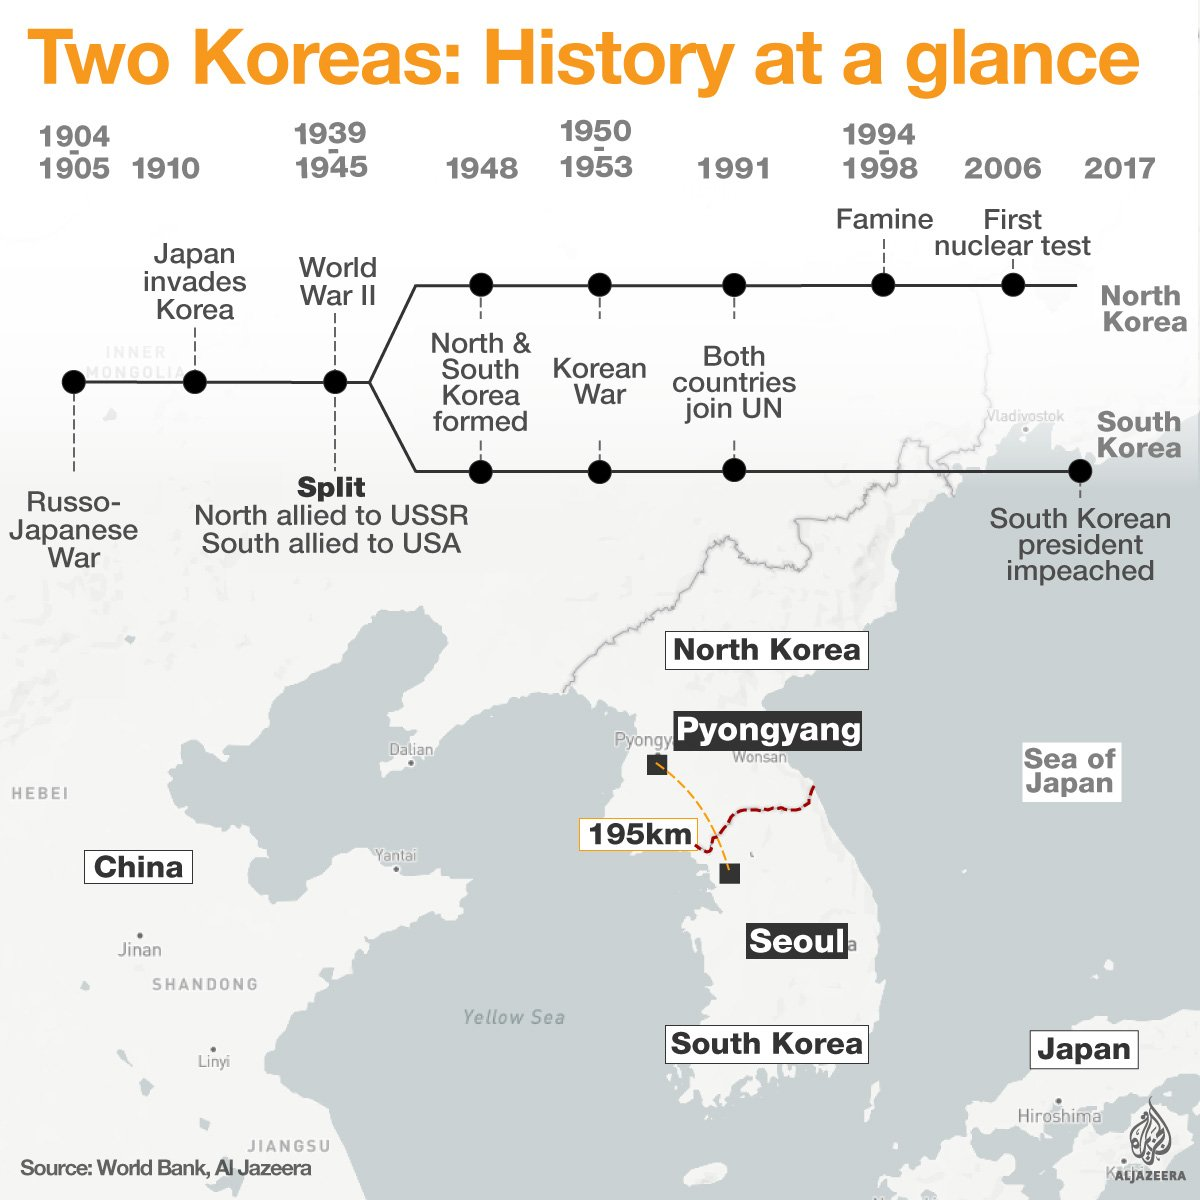 Simon Kuestenmacher On Twitter History Timeline Of The